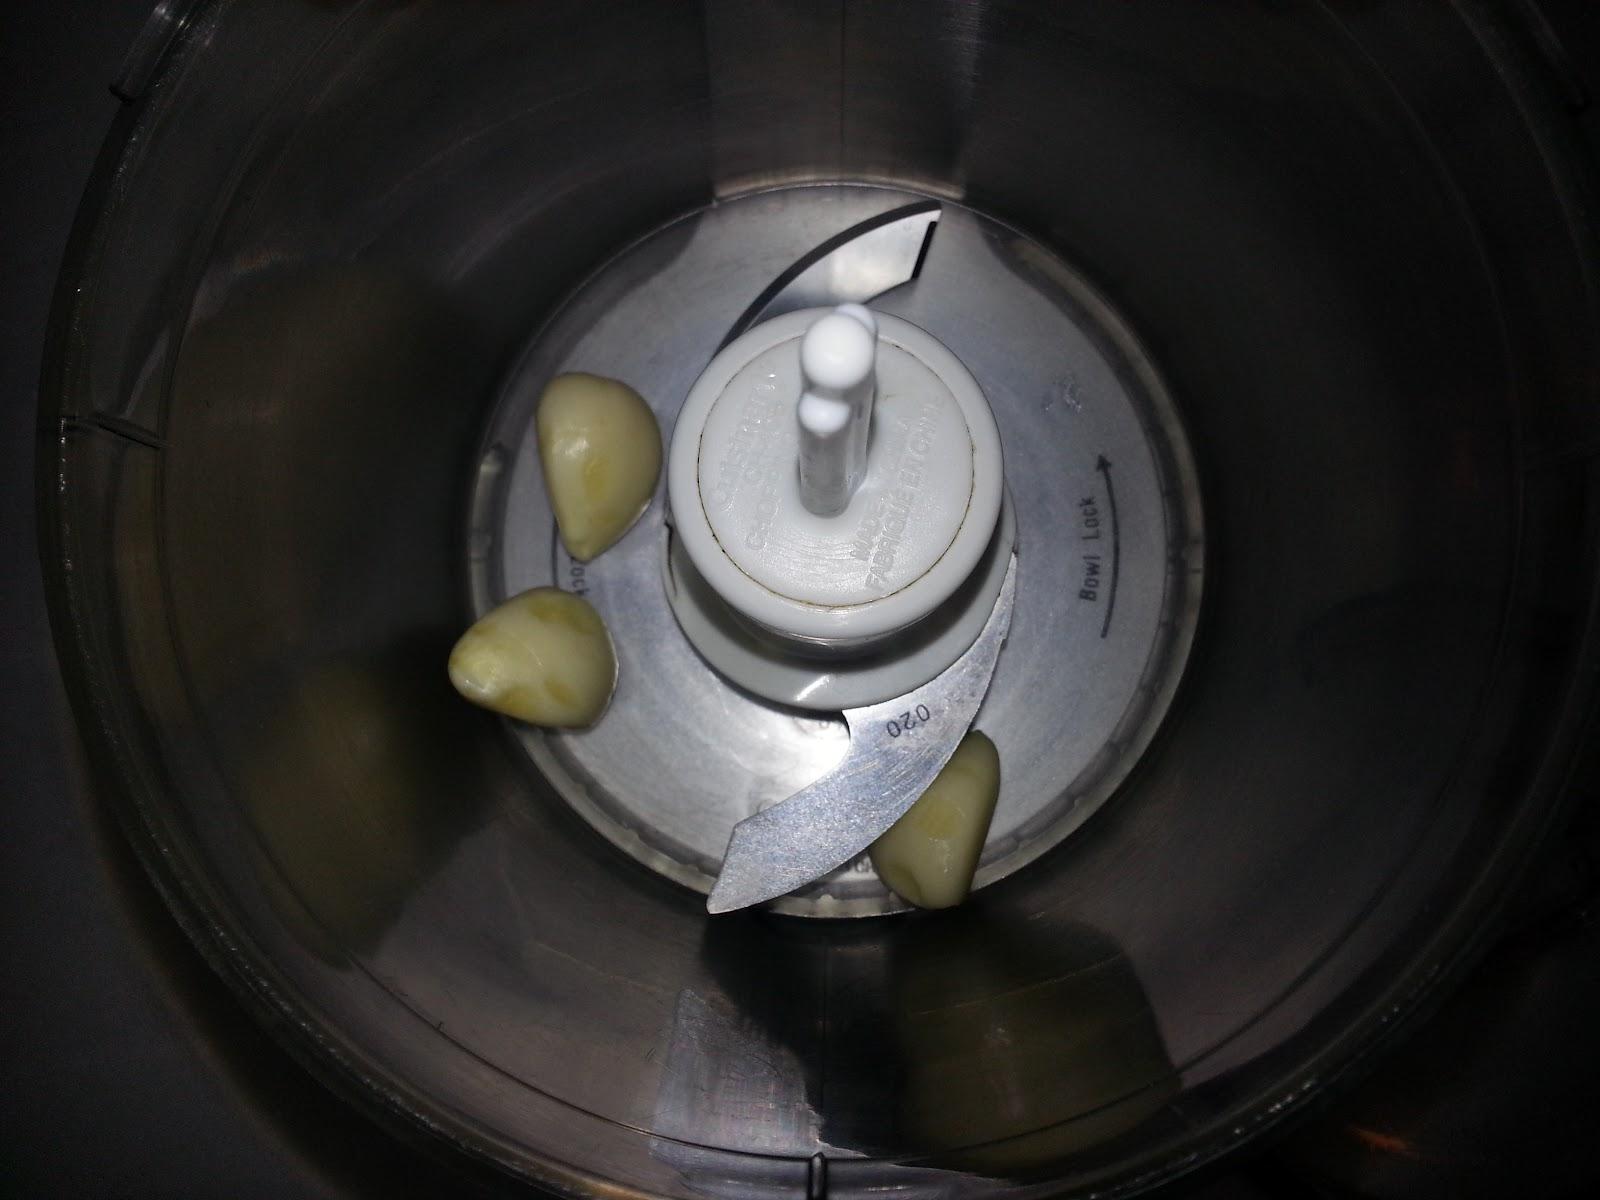 garlic in a food processor picture